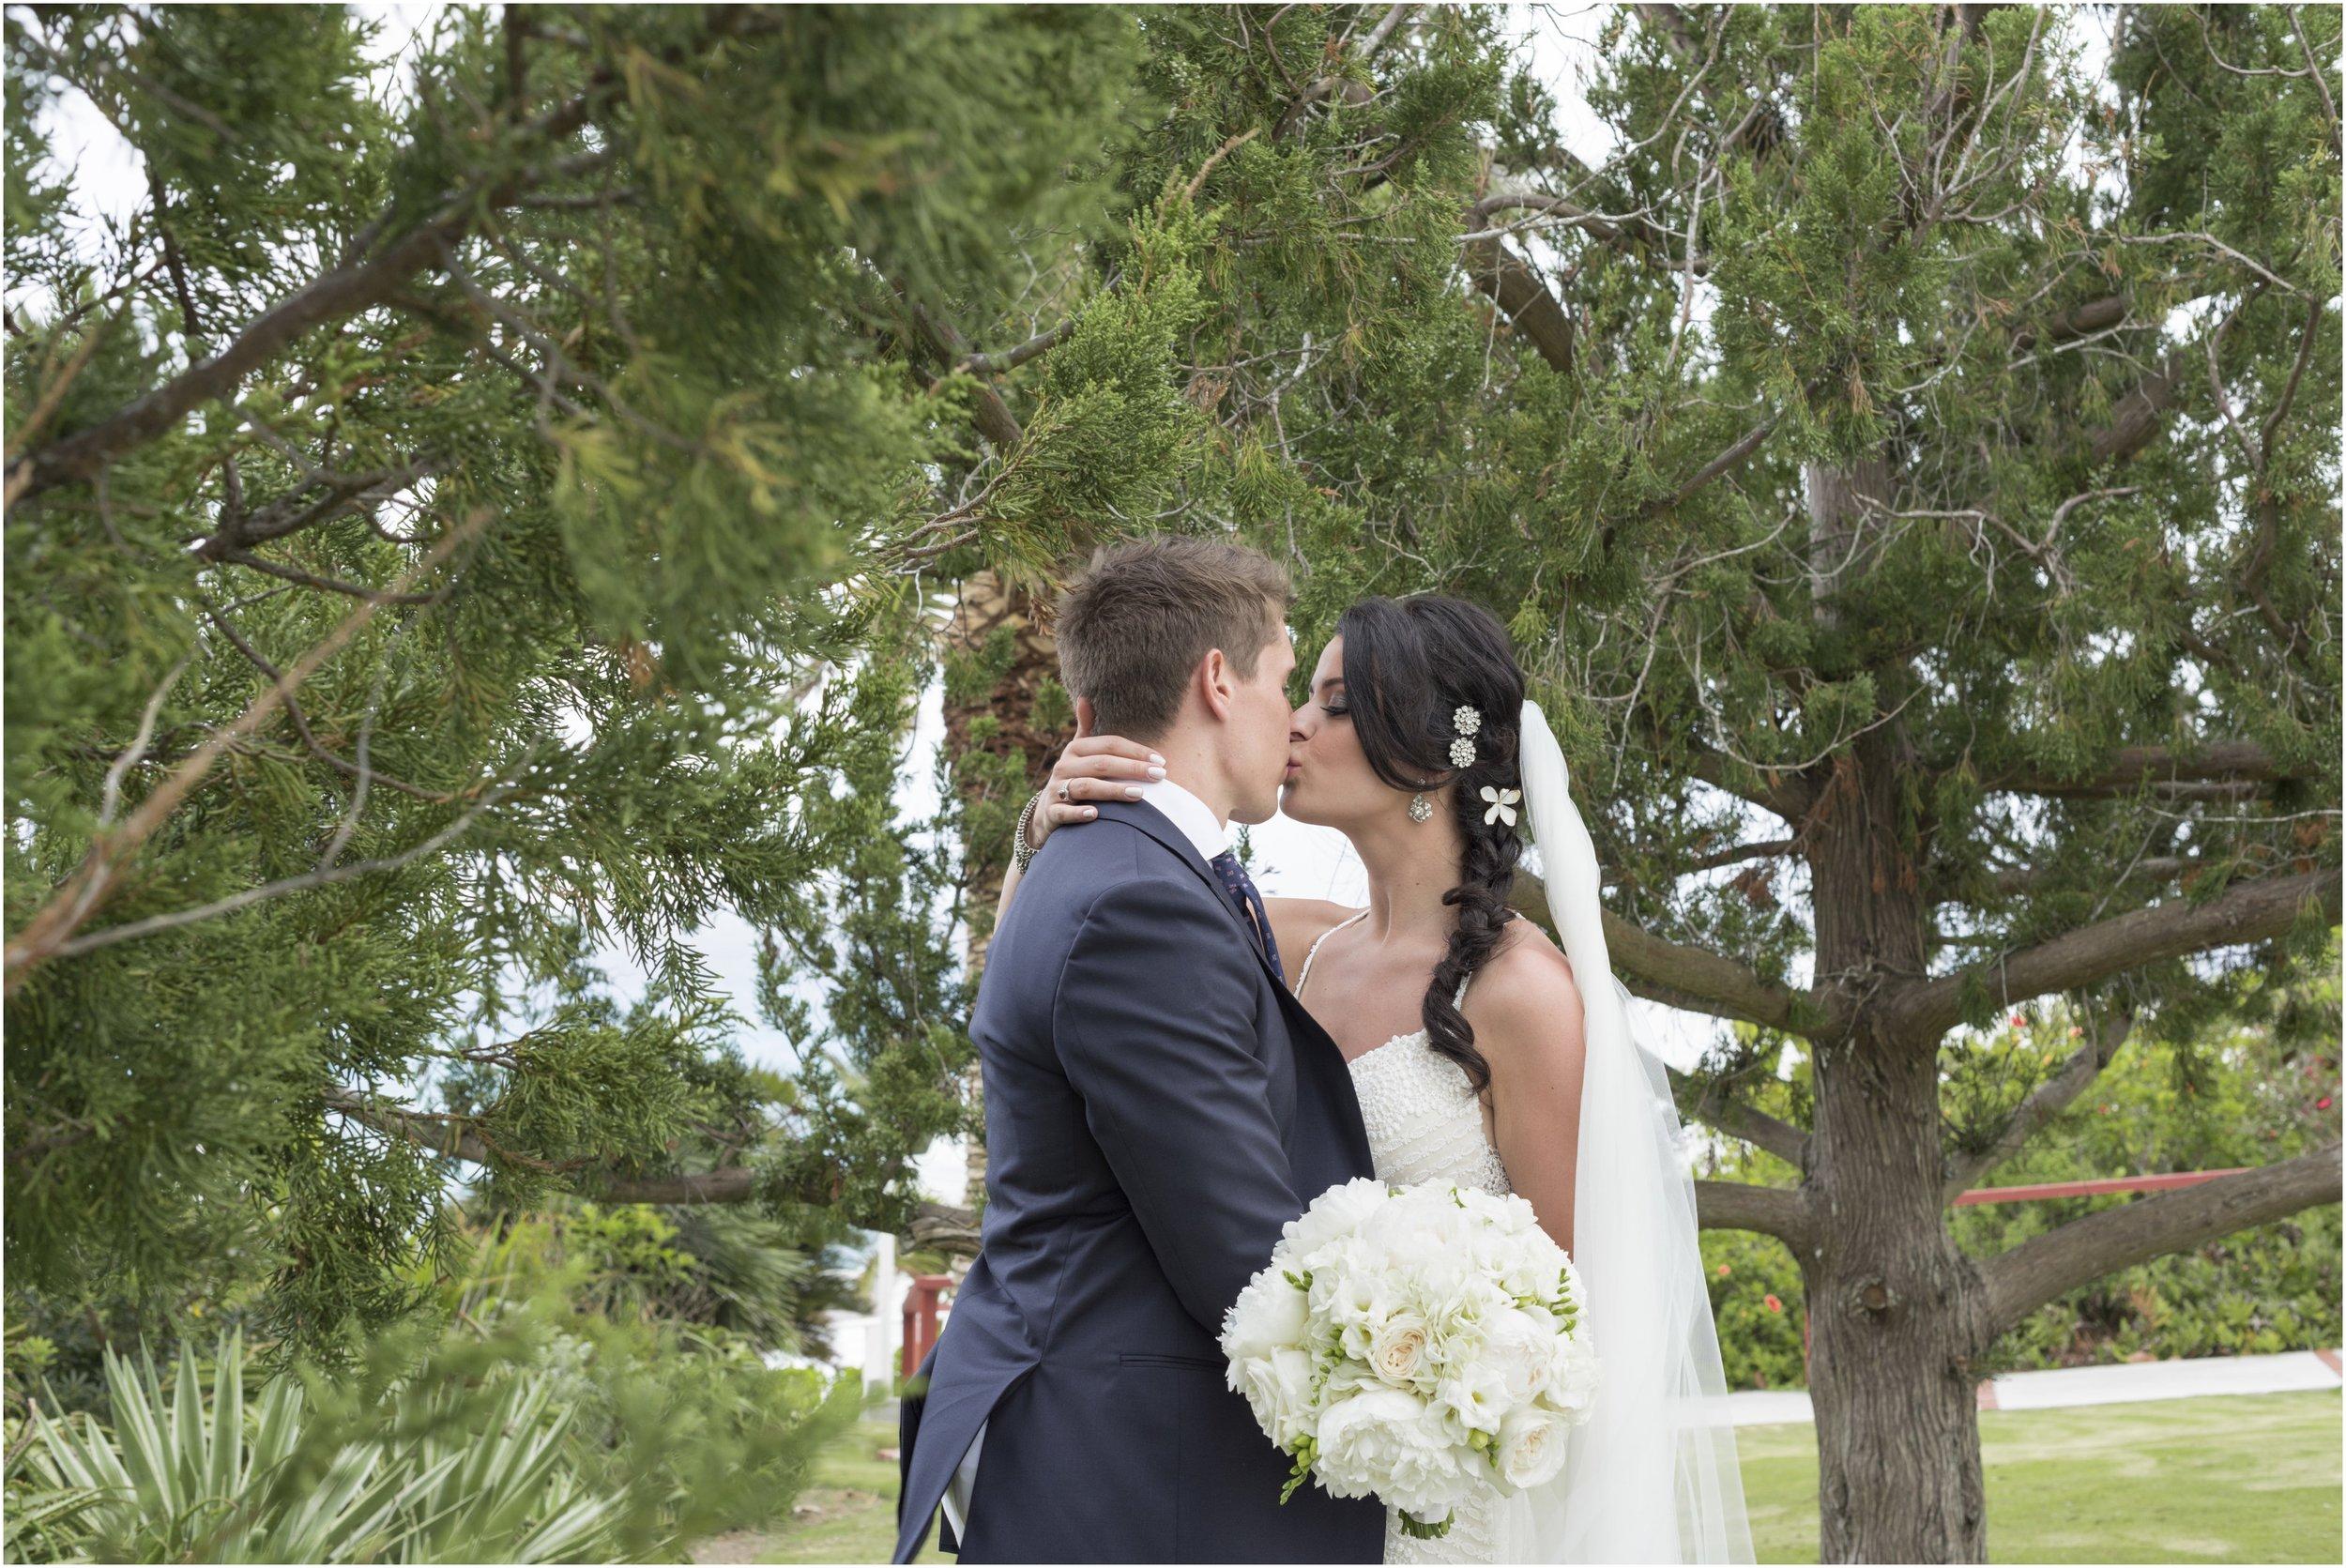 ©FianderFoto_Alyse_Stevie_Wedding_Bermuda_37.jpg